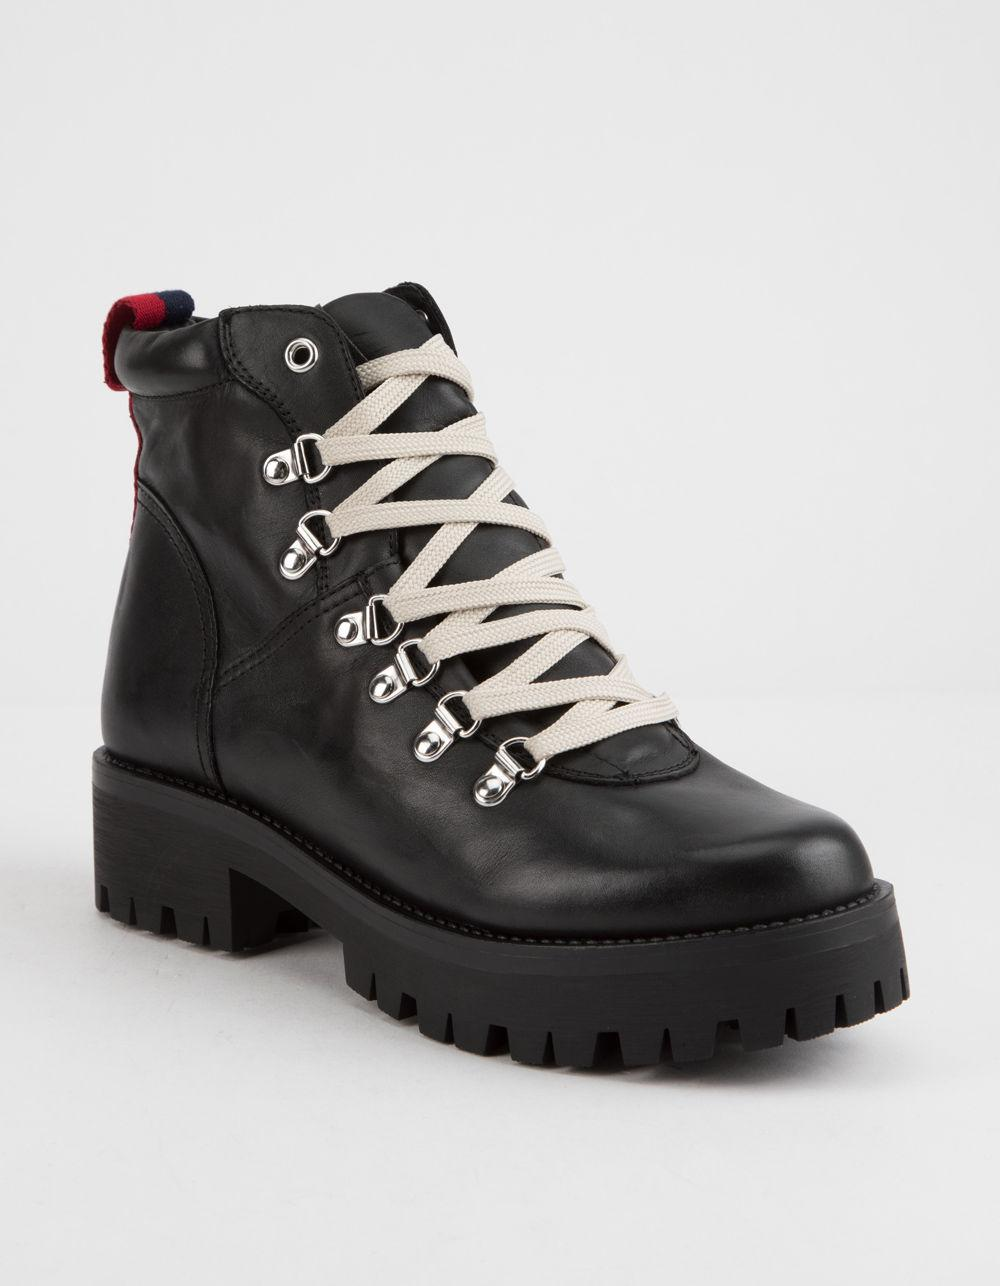 fb96db06bd0 Lyst - Steve Madden Bam Black Womens Combat Boots in Black